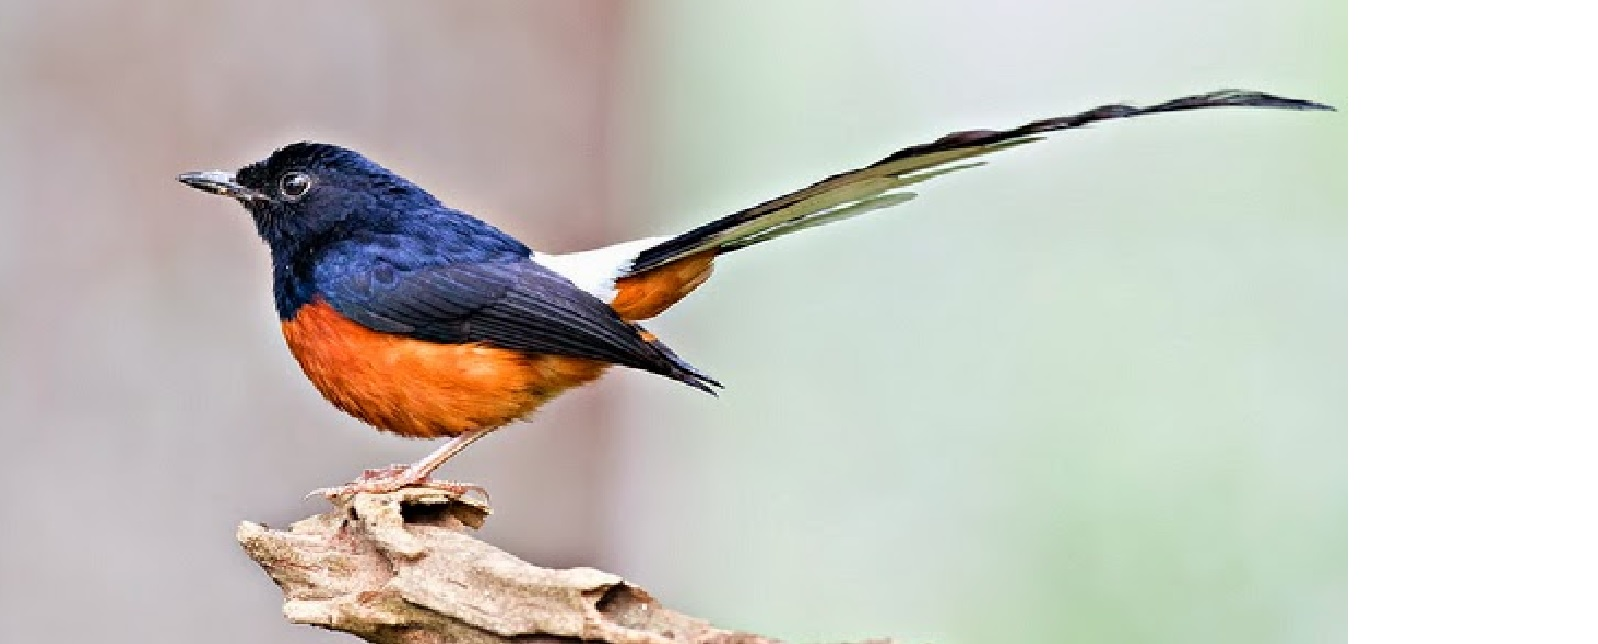 Harga Burung Murai Batu Medan 2020